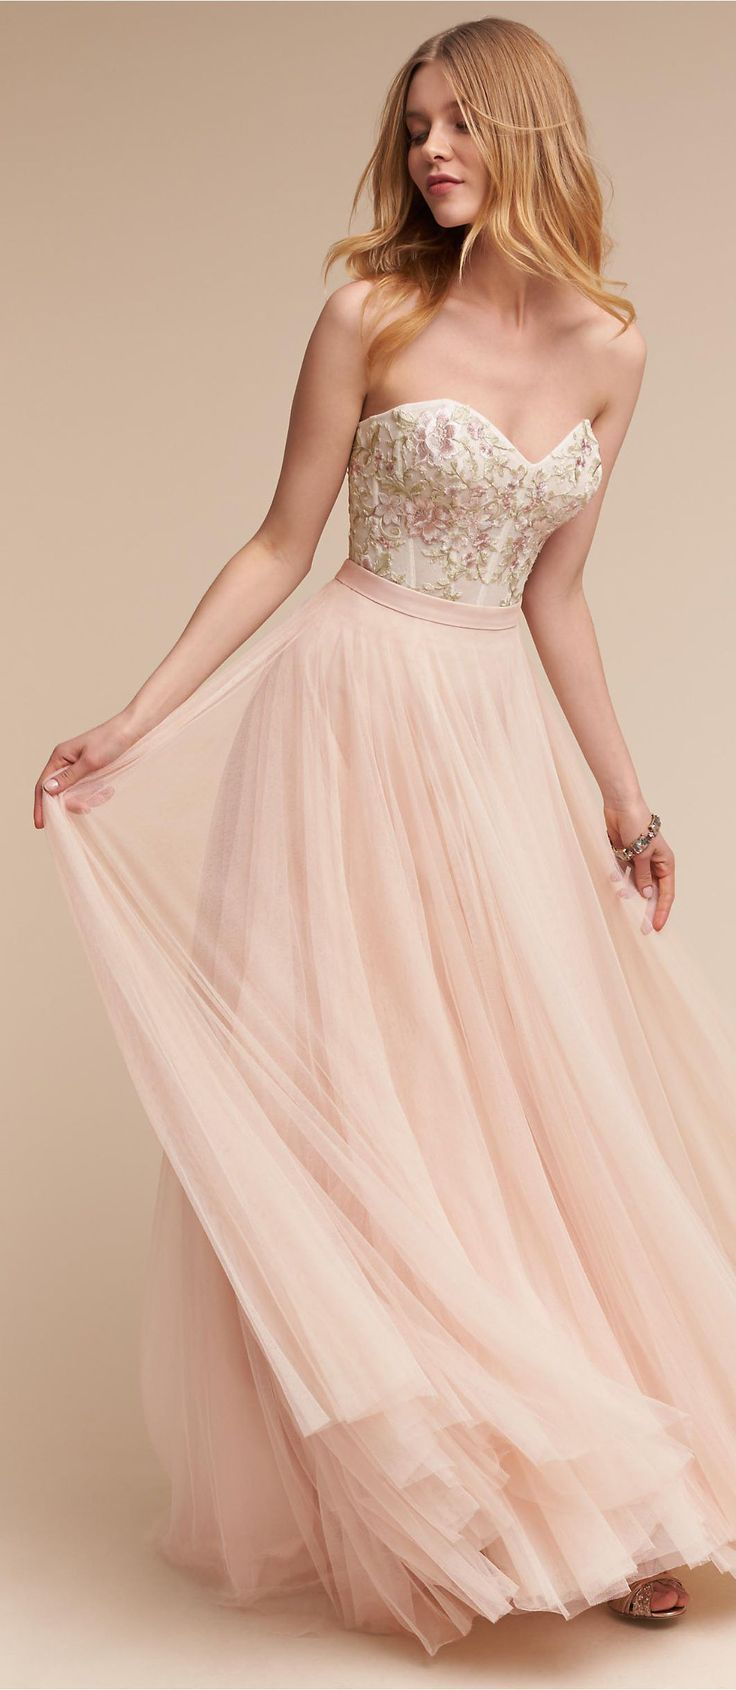 Belles wedding dress  Wedding Dress by BHLDN  Wedding Belles  Pinterest  Wedding dress